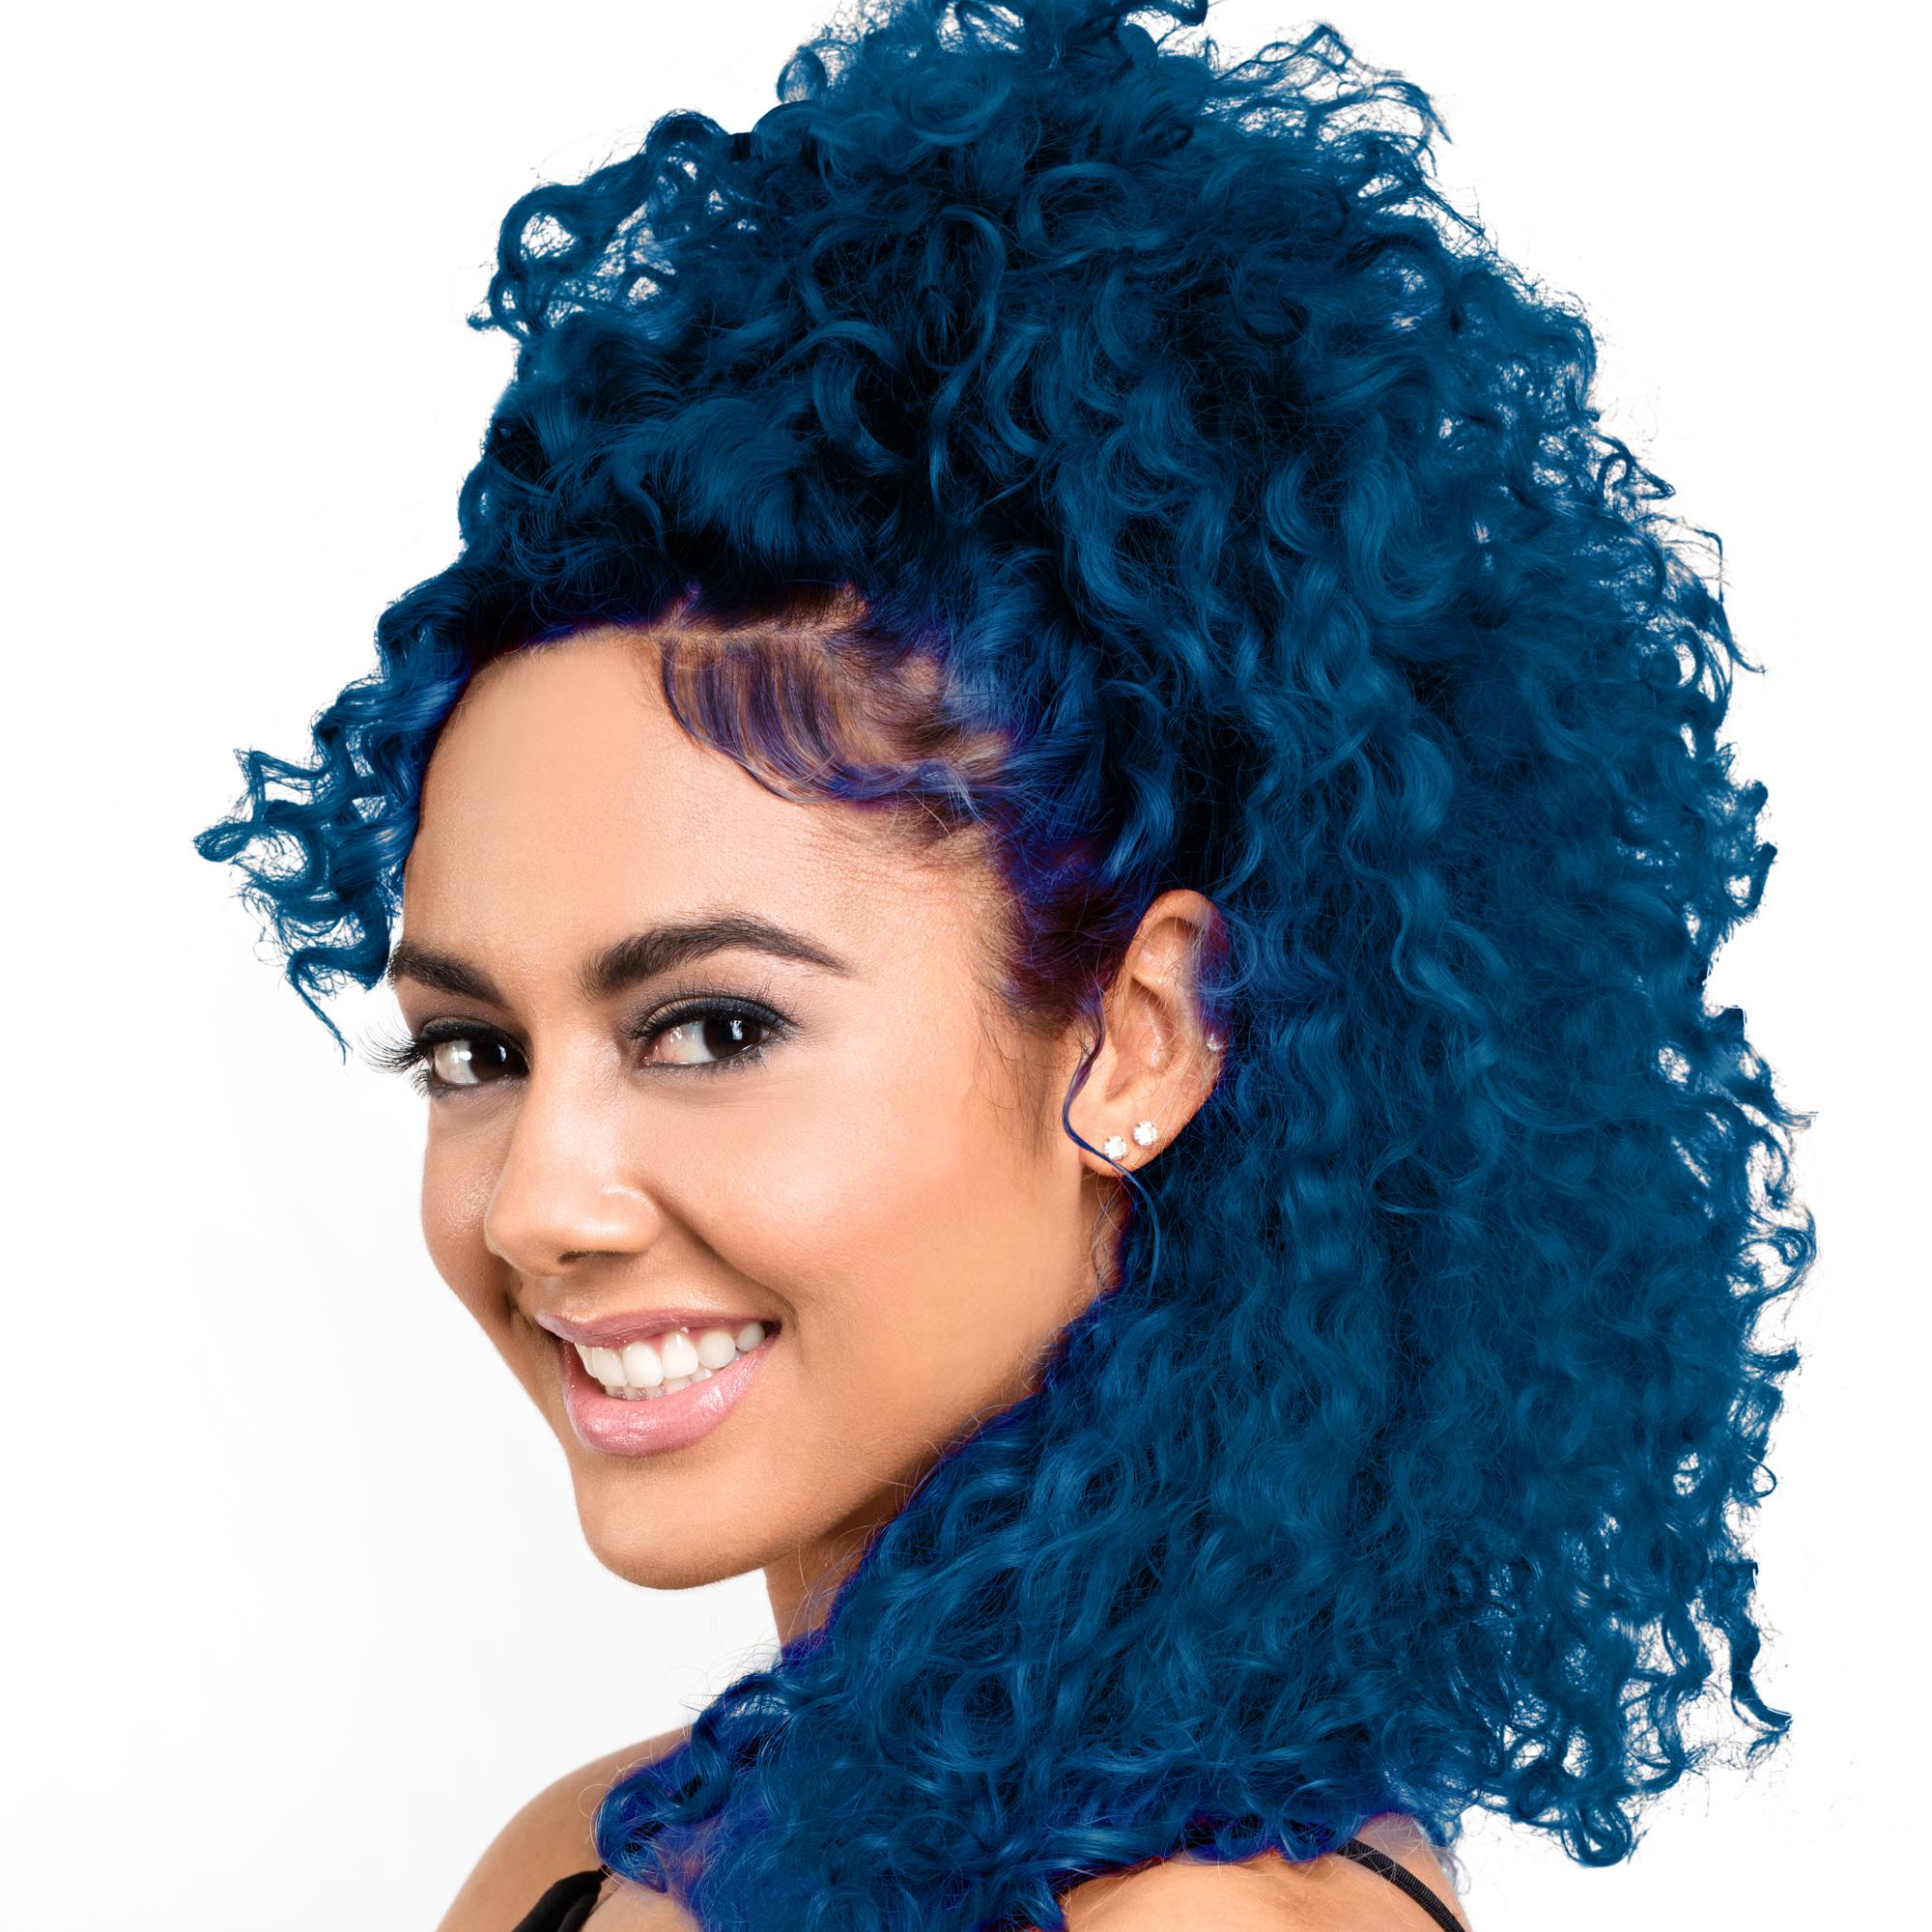 Sparks Long Lasting Bright Hair Color Creme Rinse Semi Permanent Dye